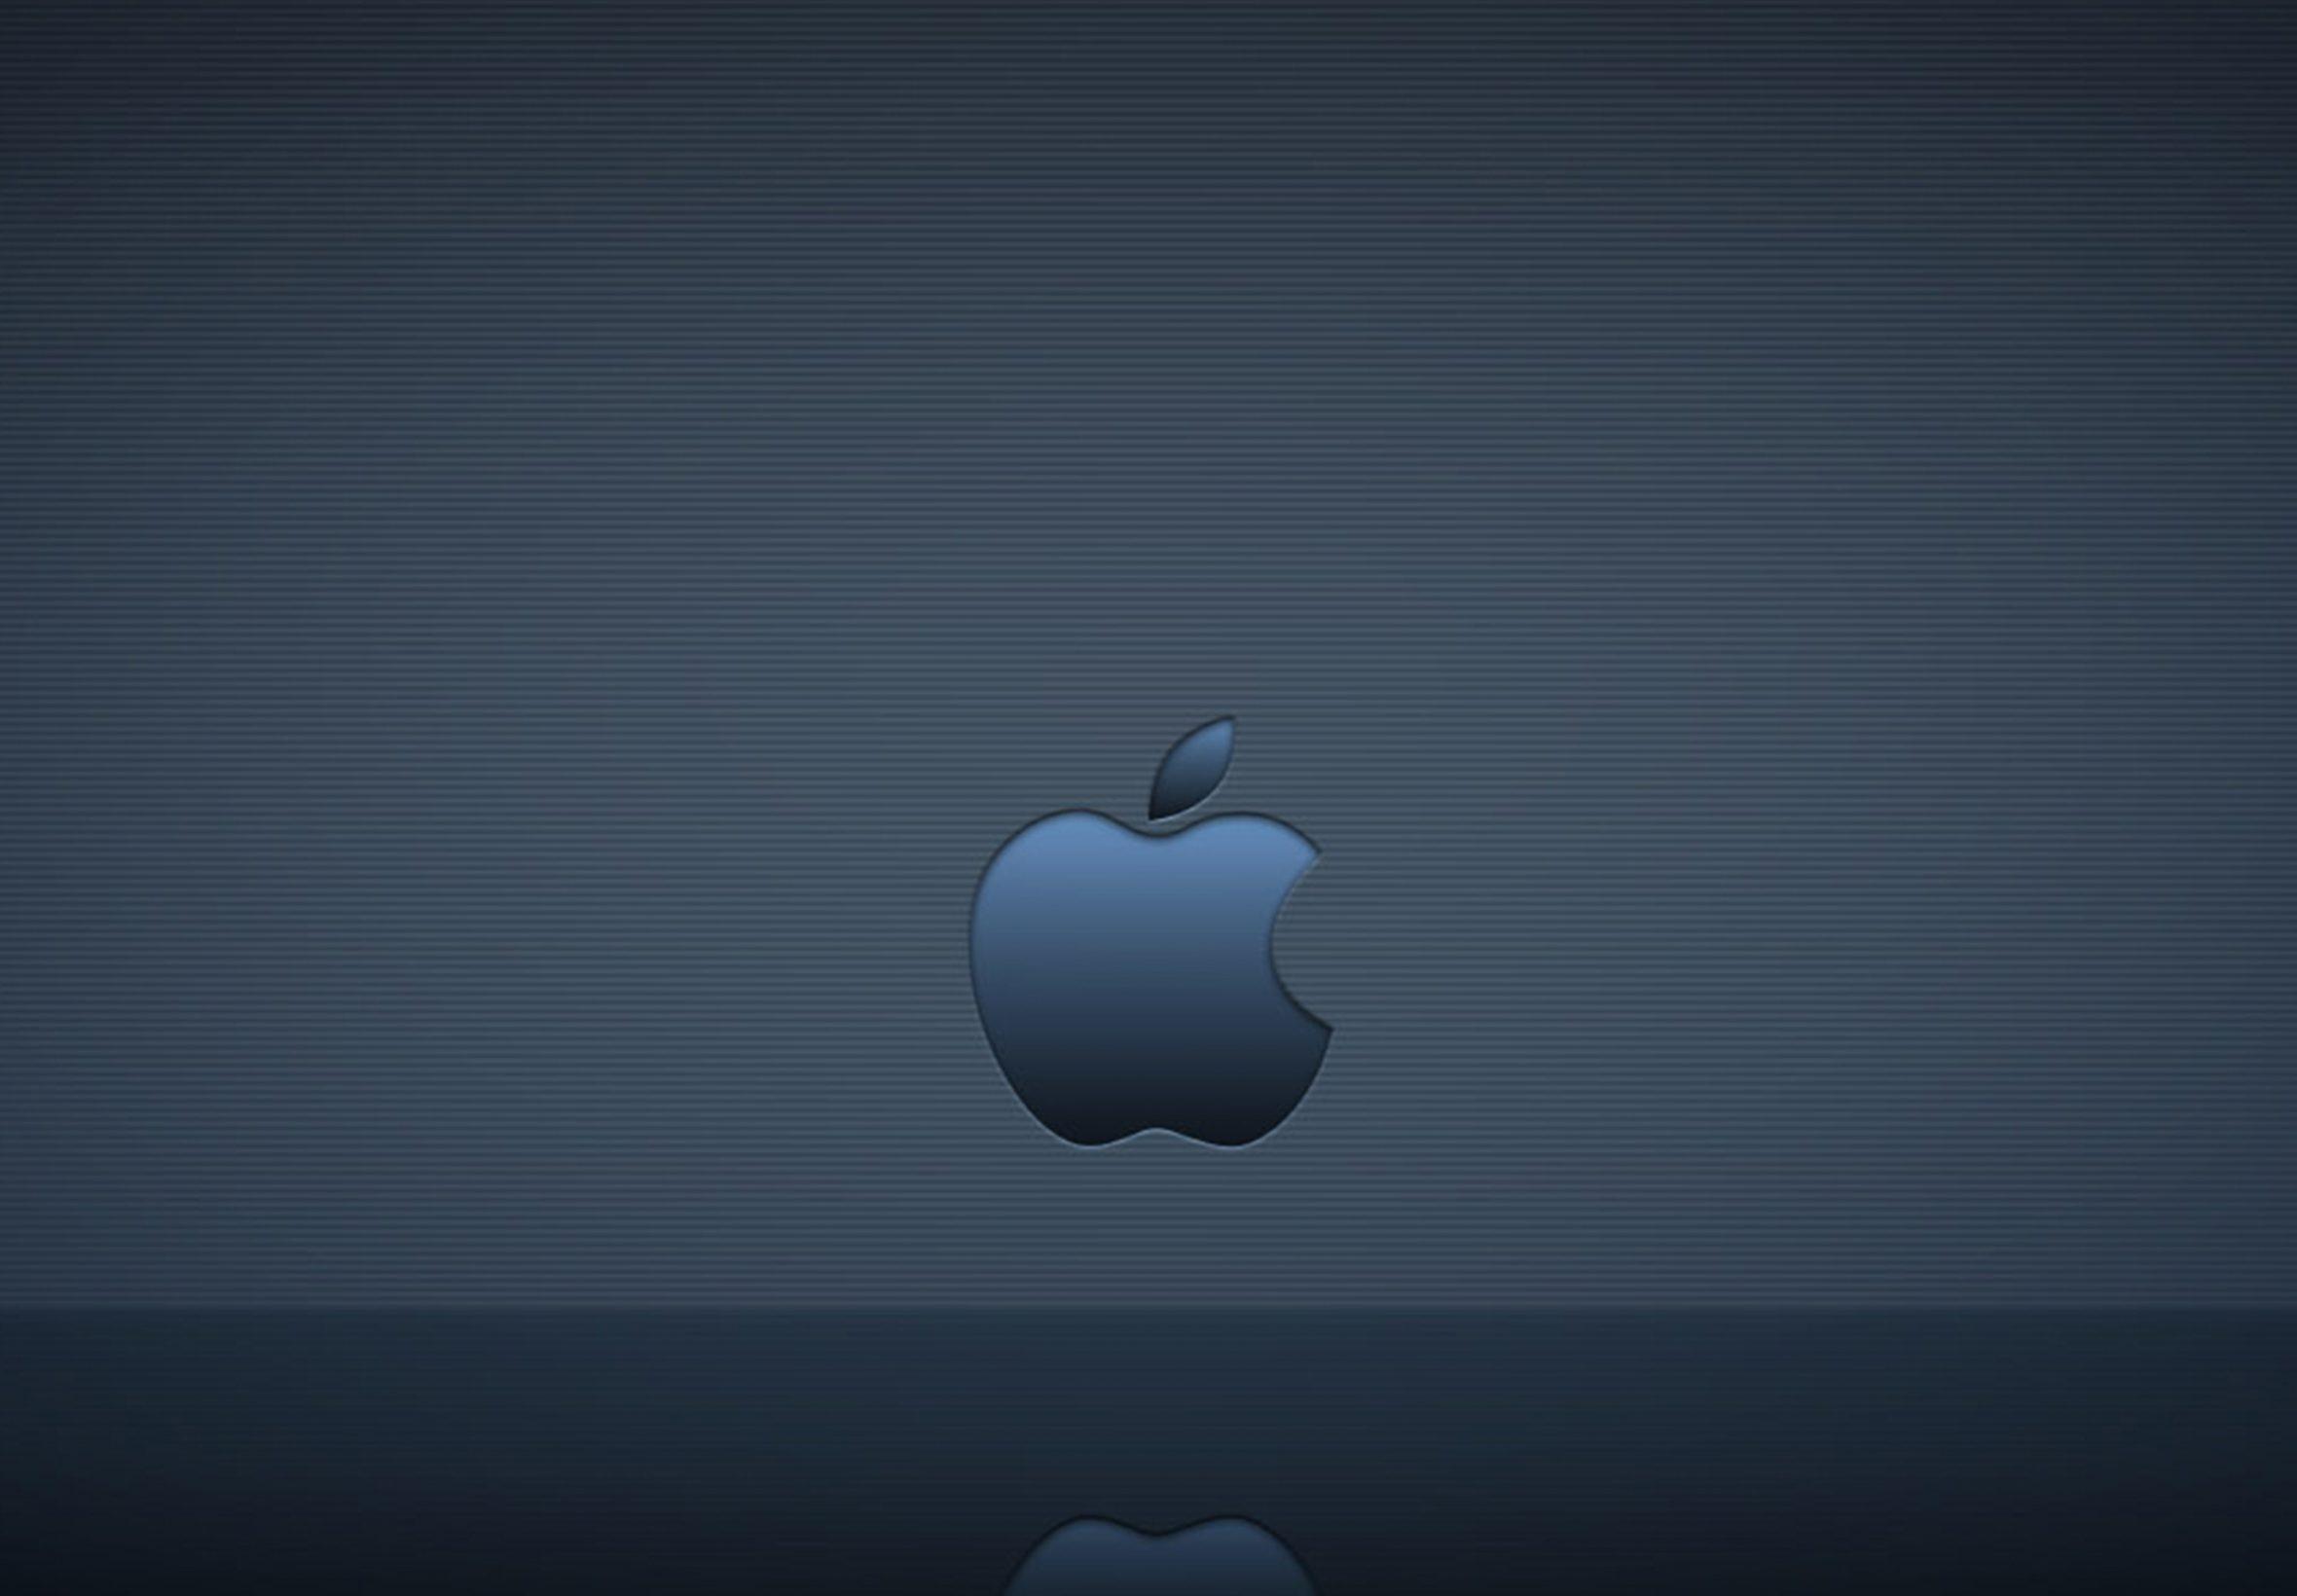 2360x1640 iPad Air wallpaper 4k Apple Logo Reflection Ipad Wallpaper 2360x1640 pixels resolution